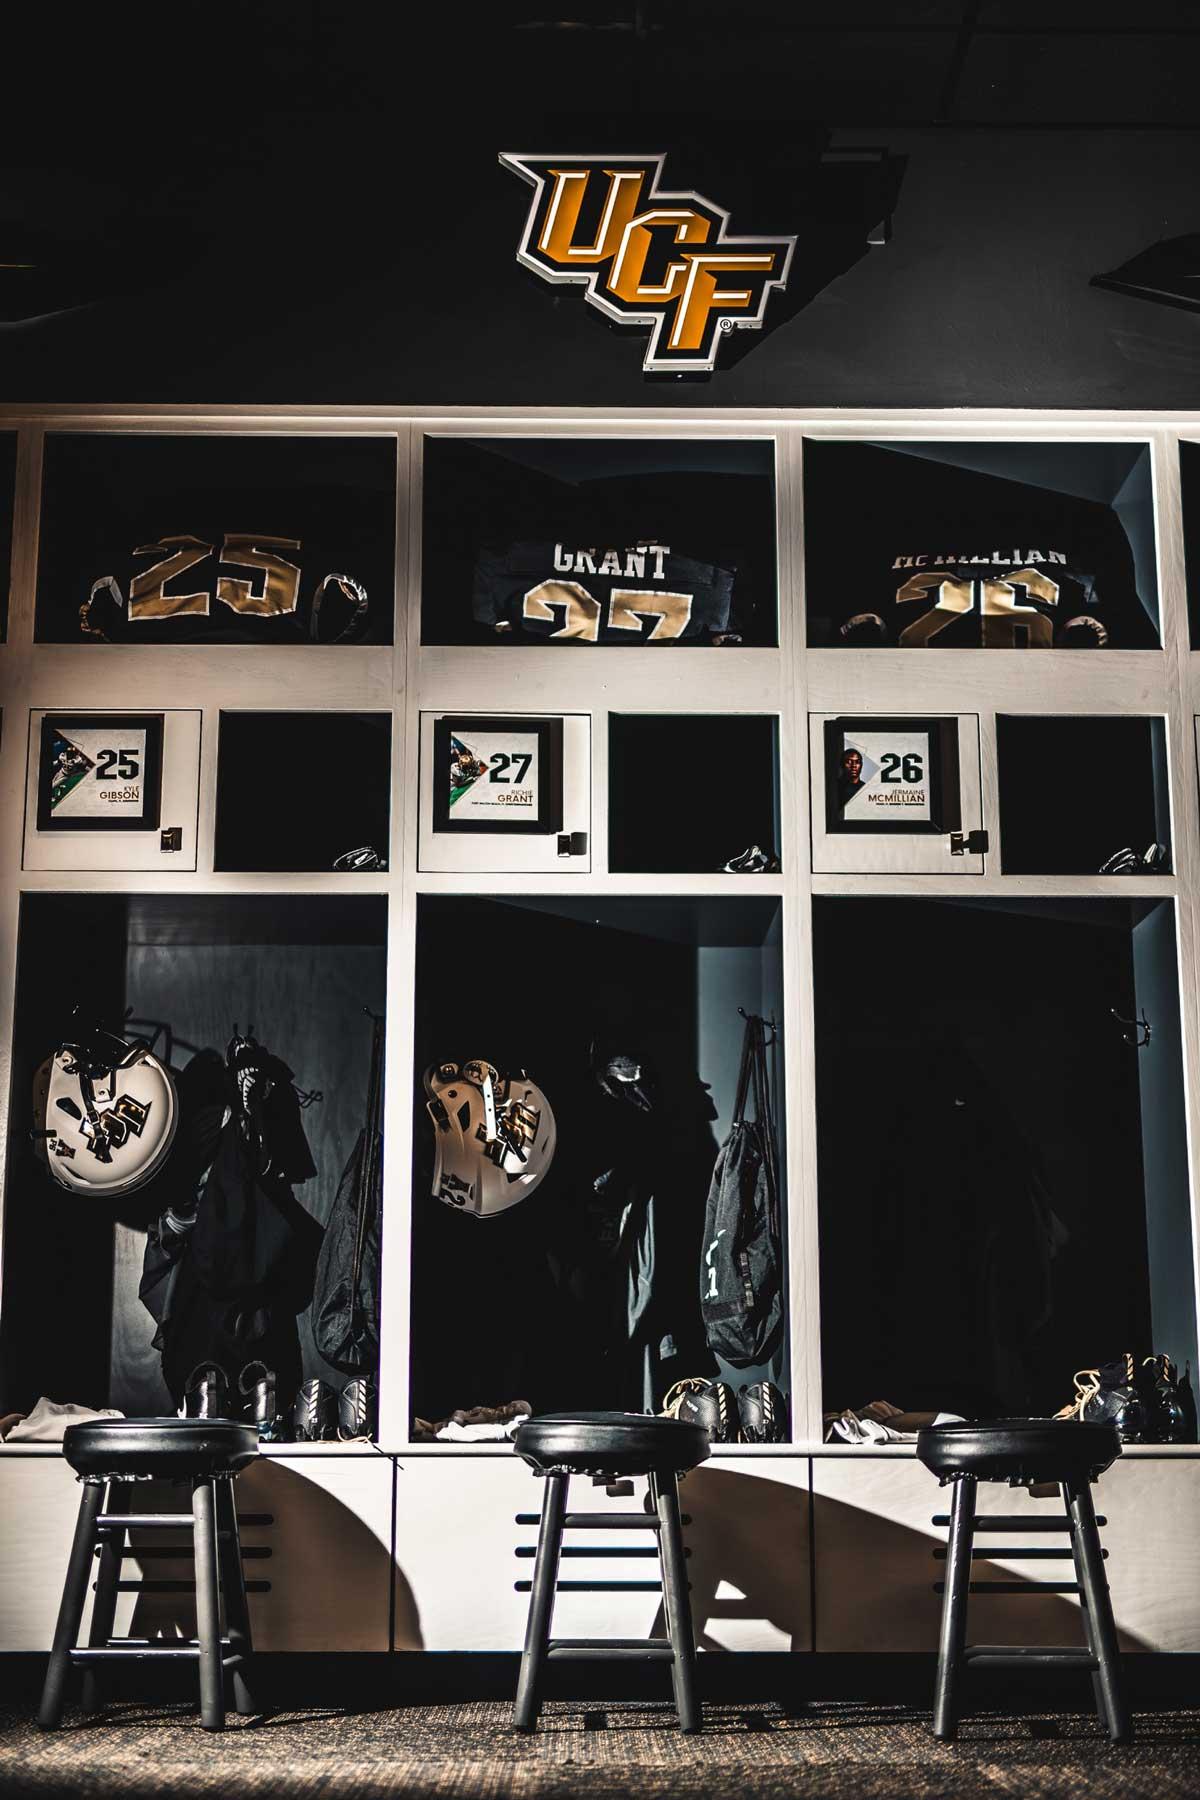 Row of three lockers with white football helmets and black jerseys